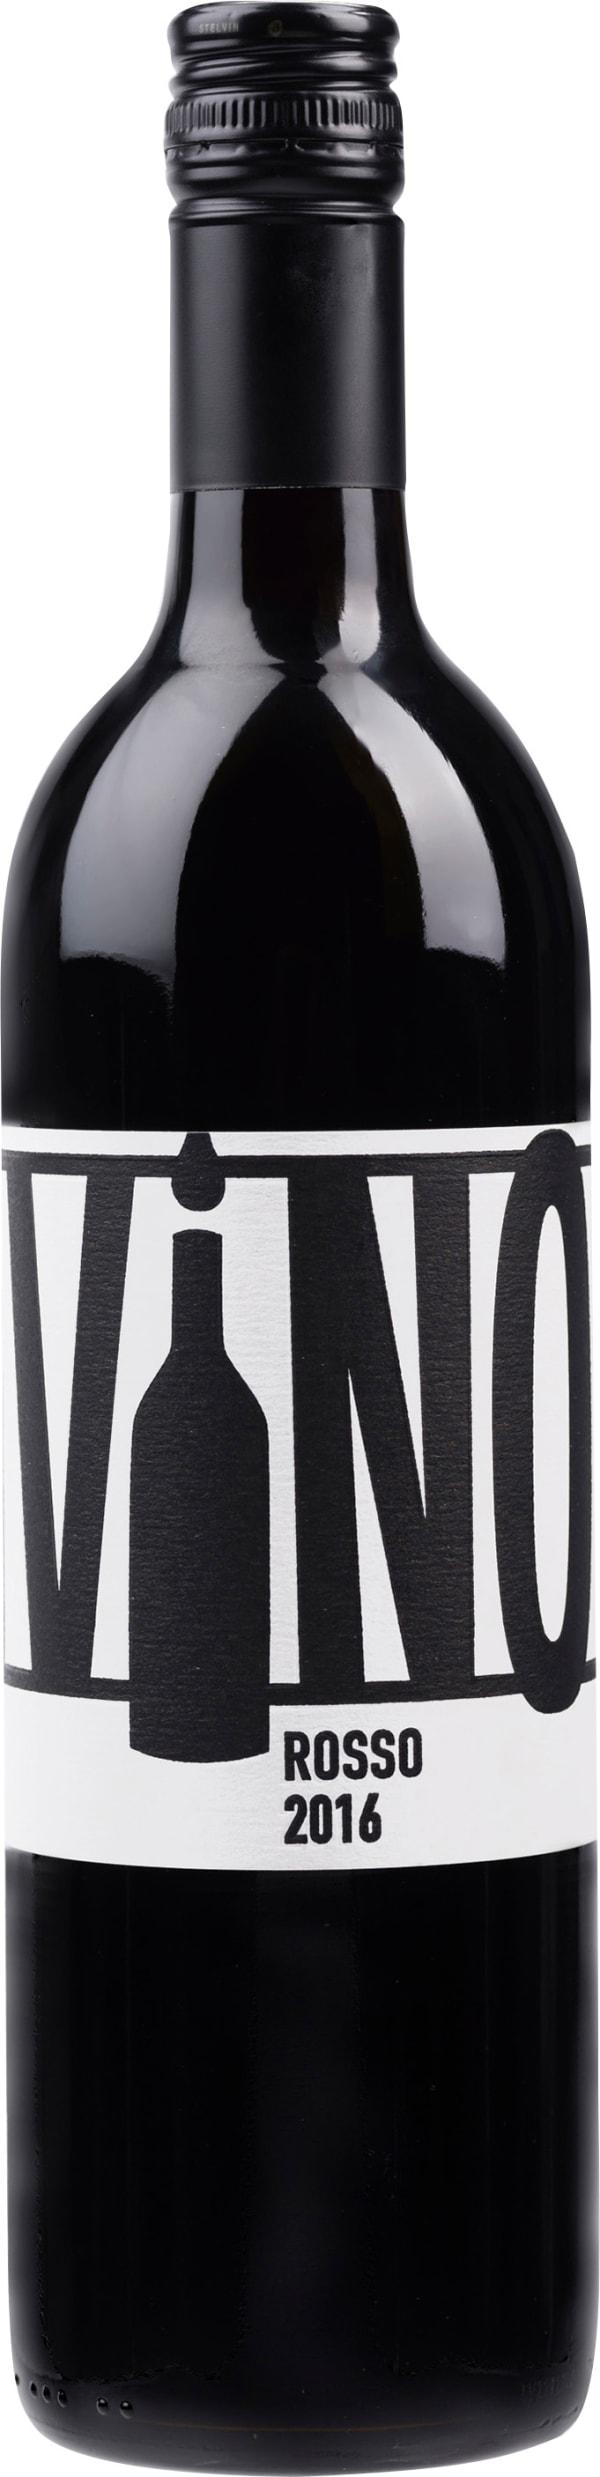 Casasmith Vino Rosso 2016